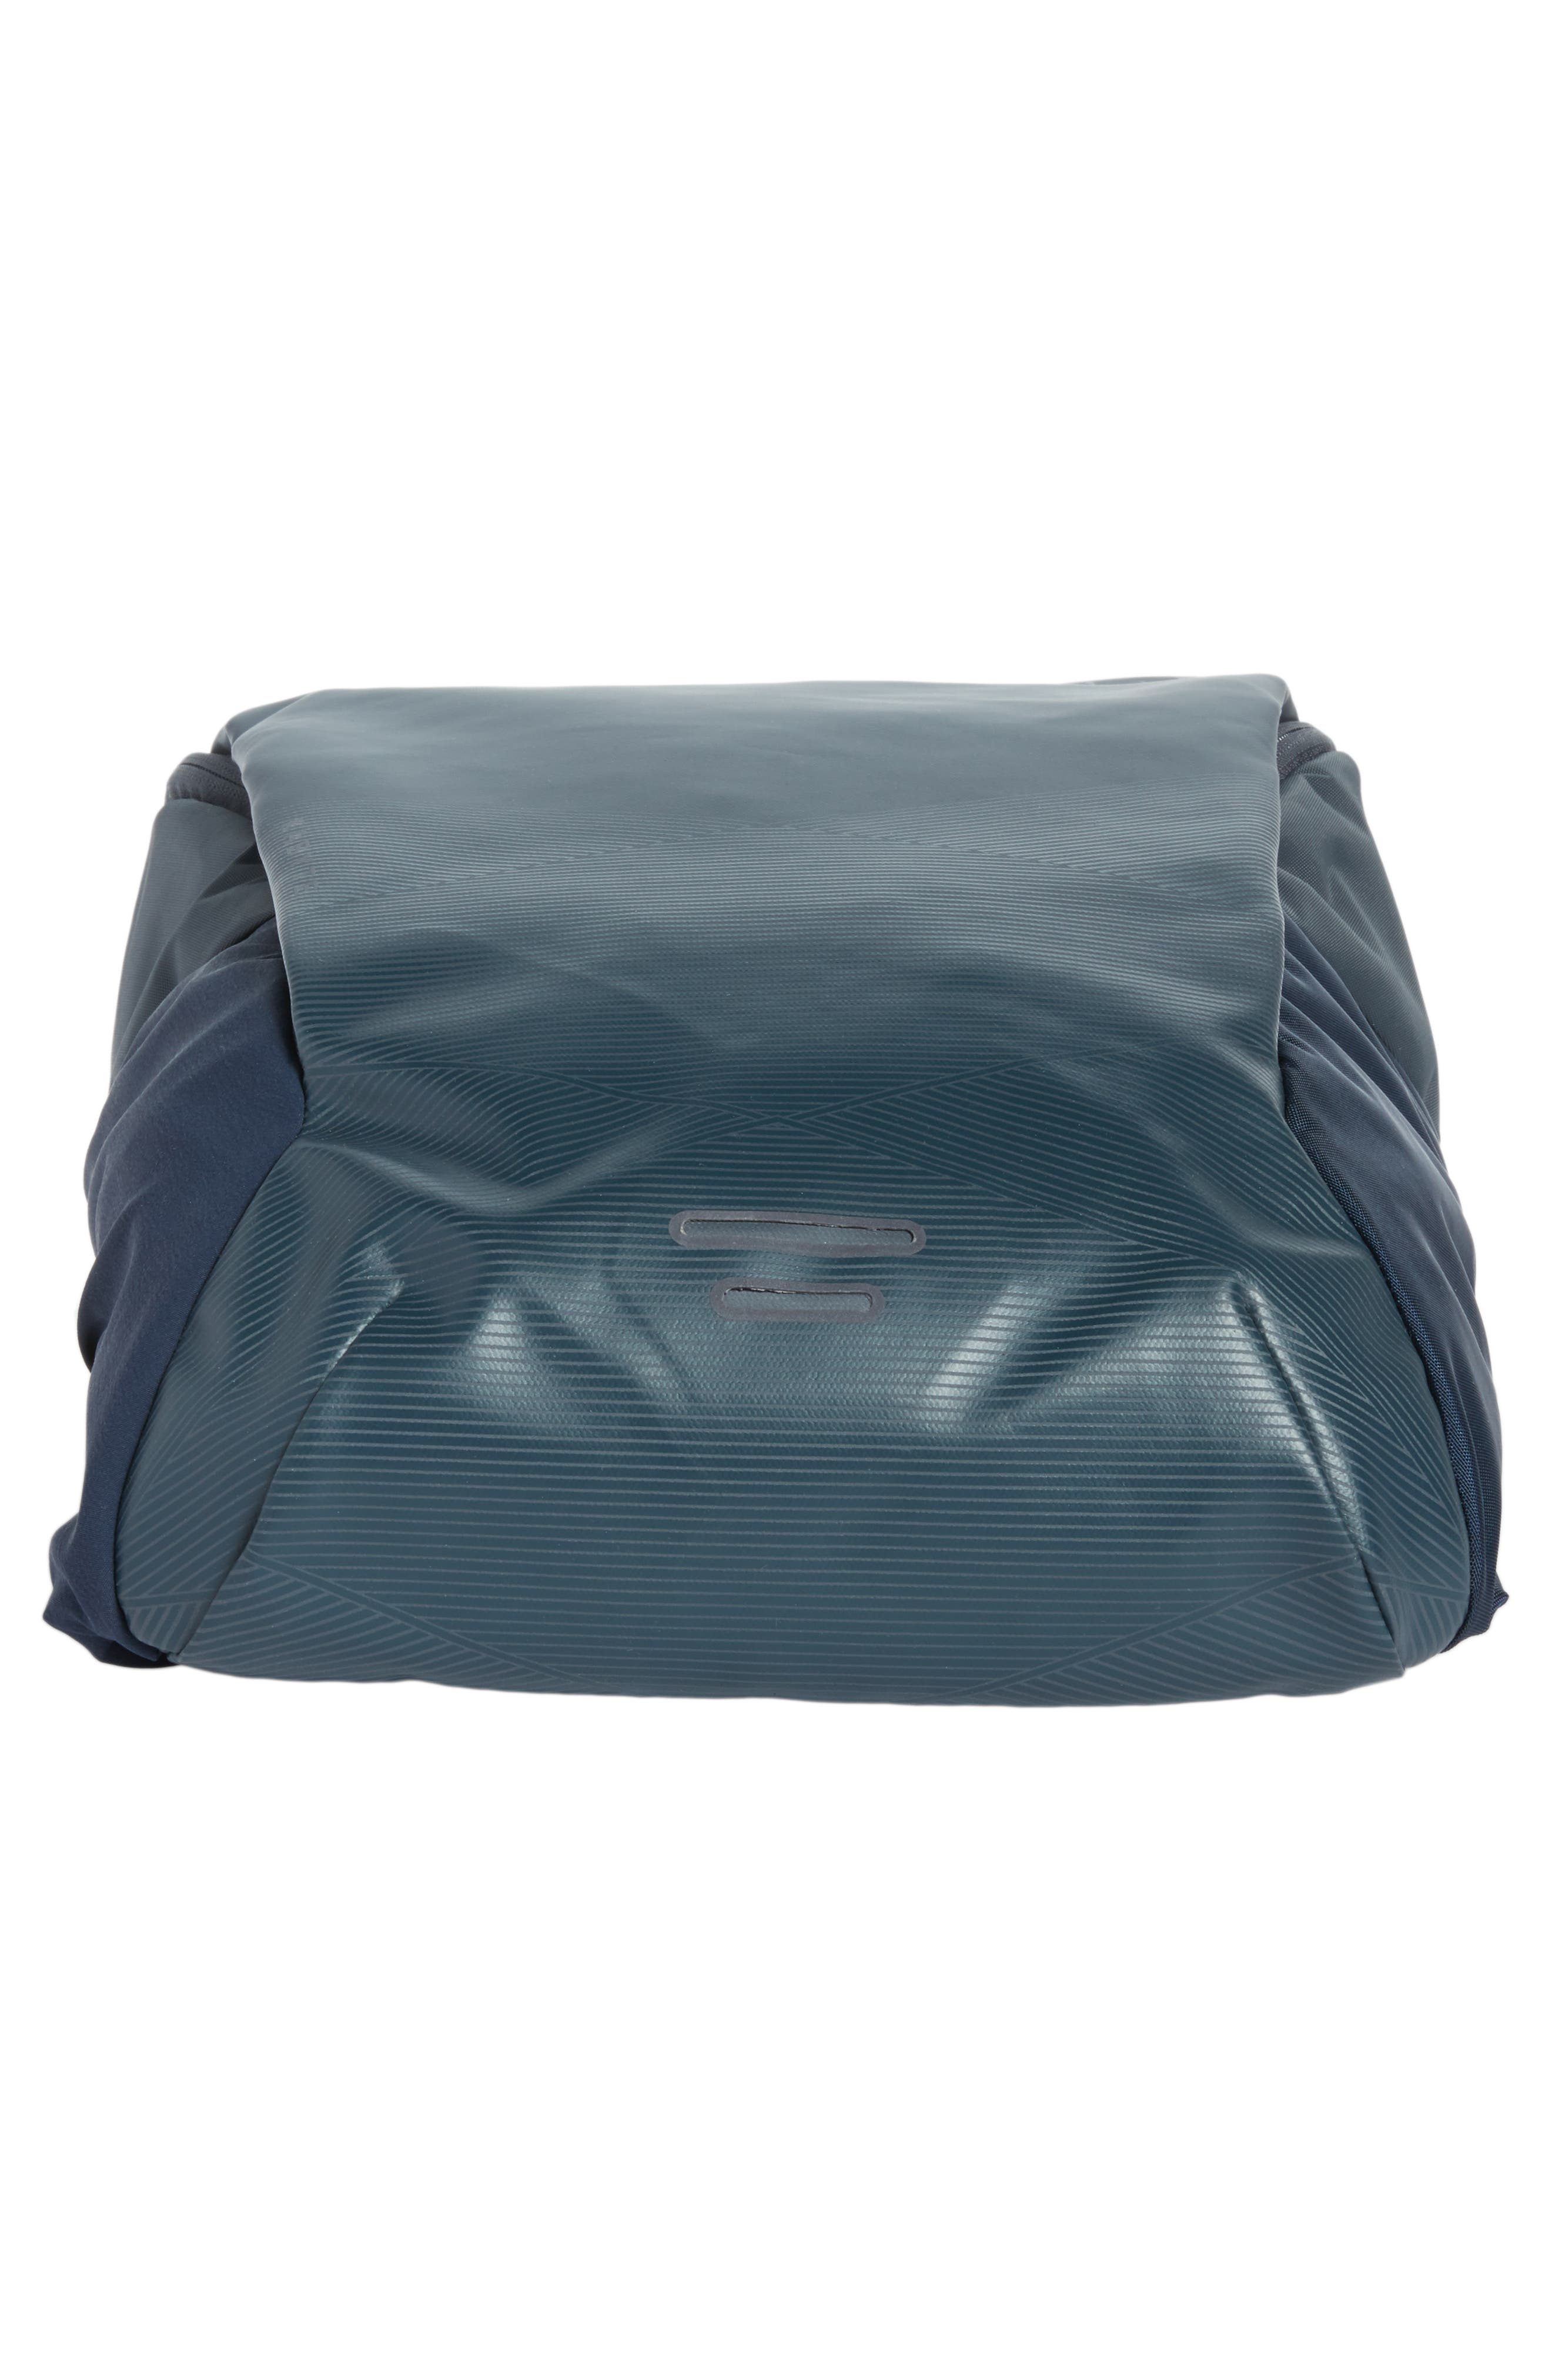 Kabyte Backpack,                             Alternate thumbnail 6, color,                             VANADIS GREY/ URBAN NAVY